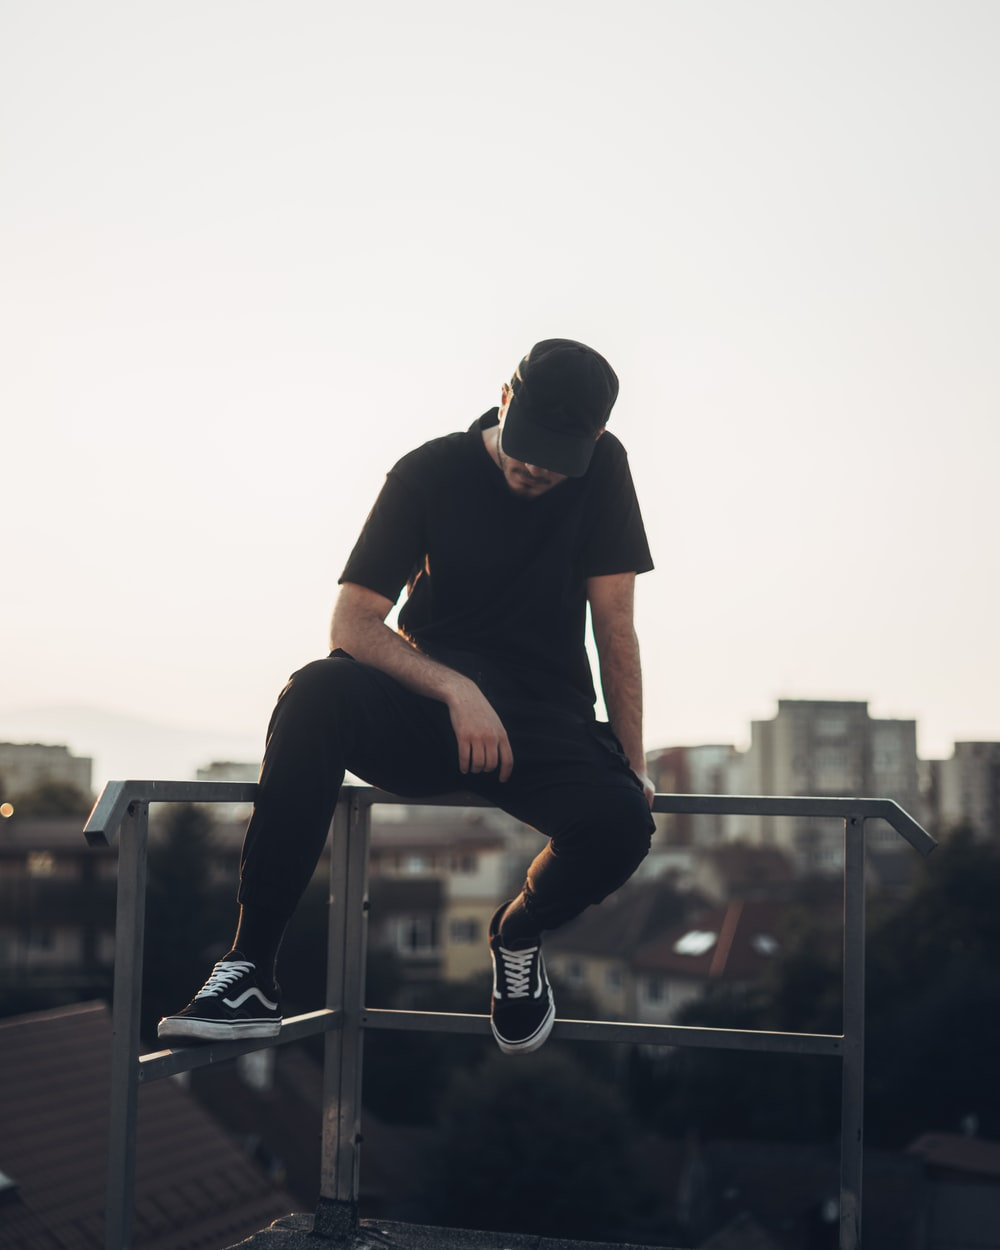 man in black crew neck t-shirt and black pants sitting on gray metal railings